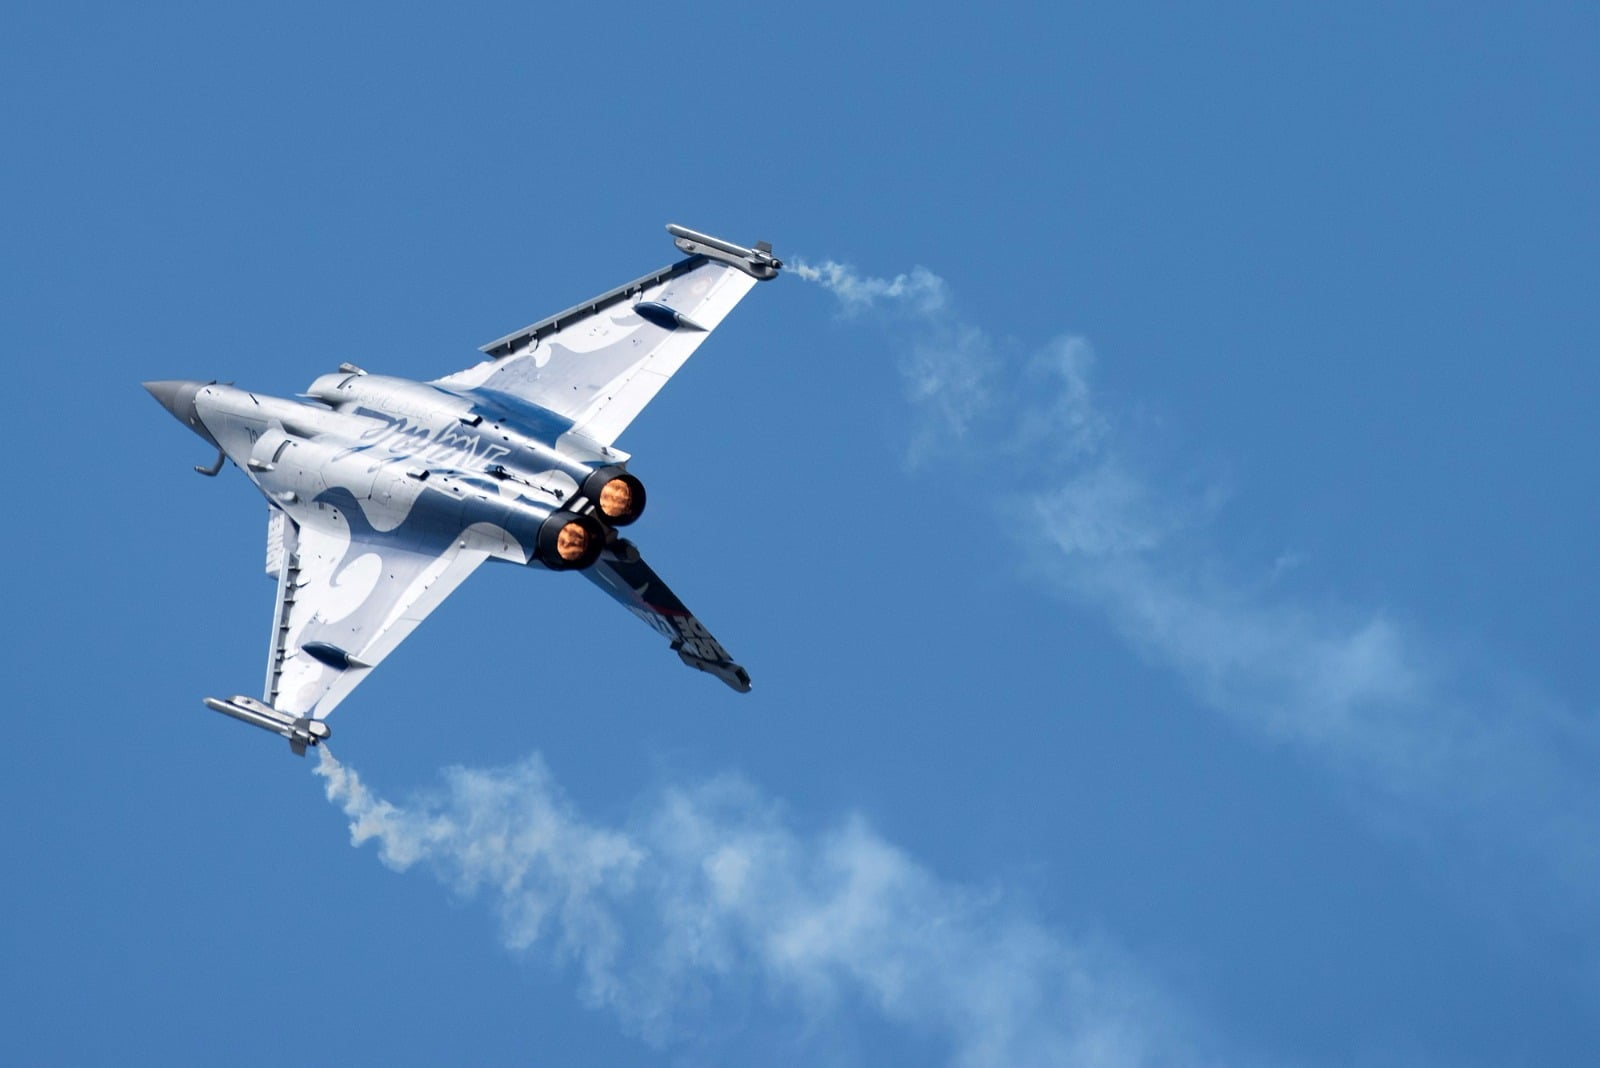 The Rafale, the latest Dassault Aviation combat aircraft